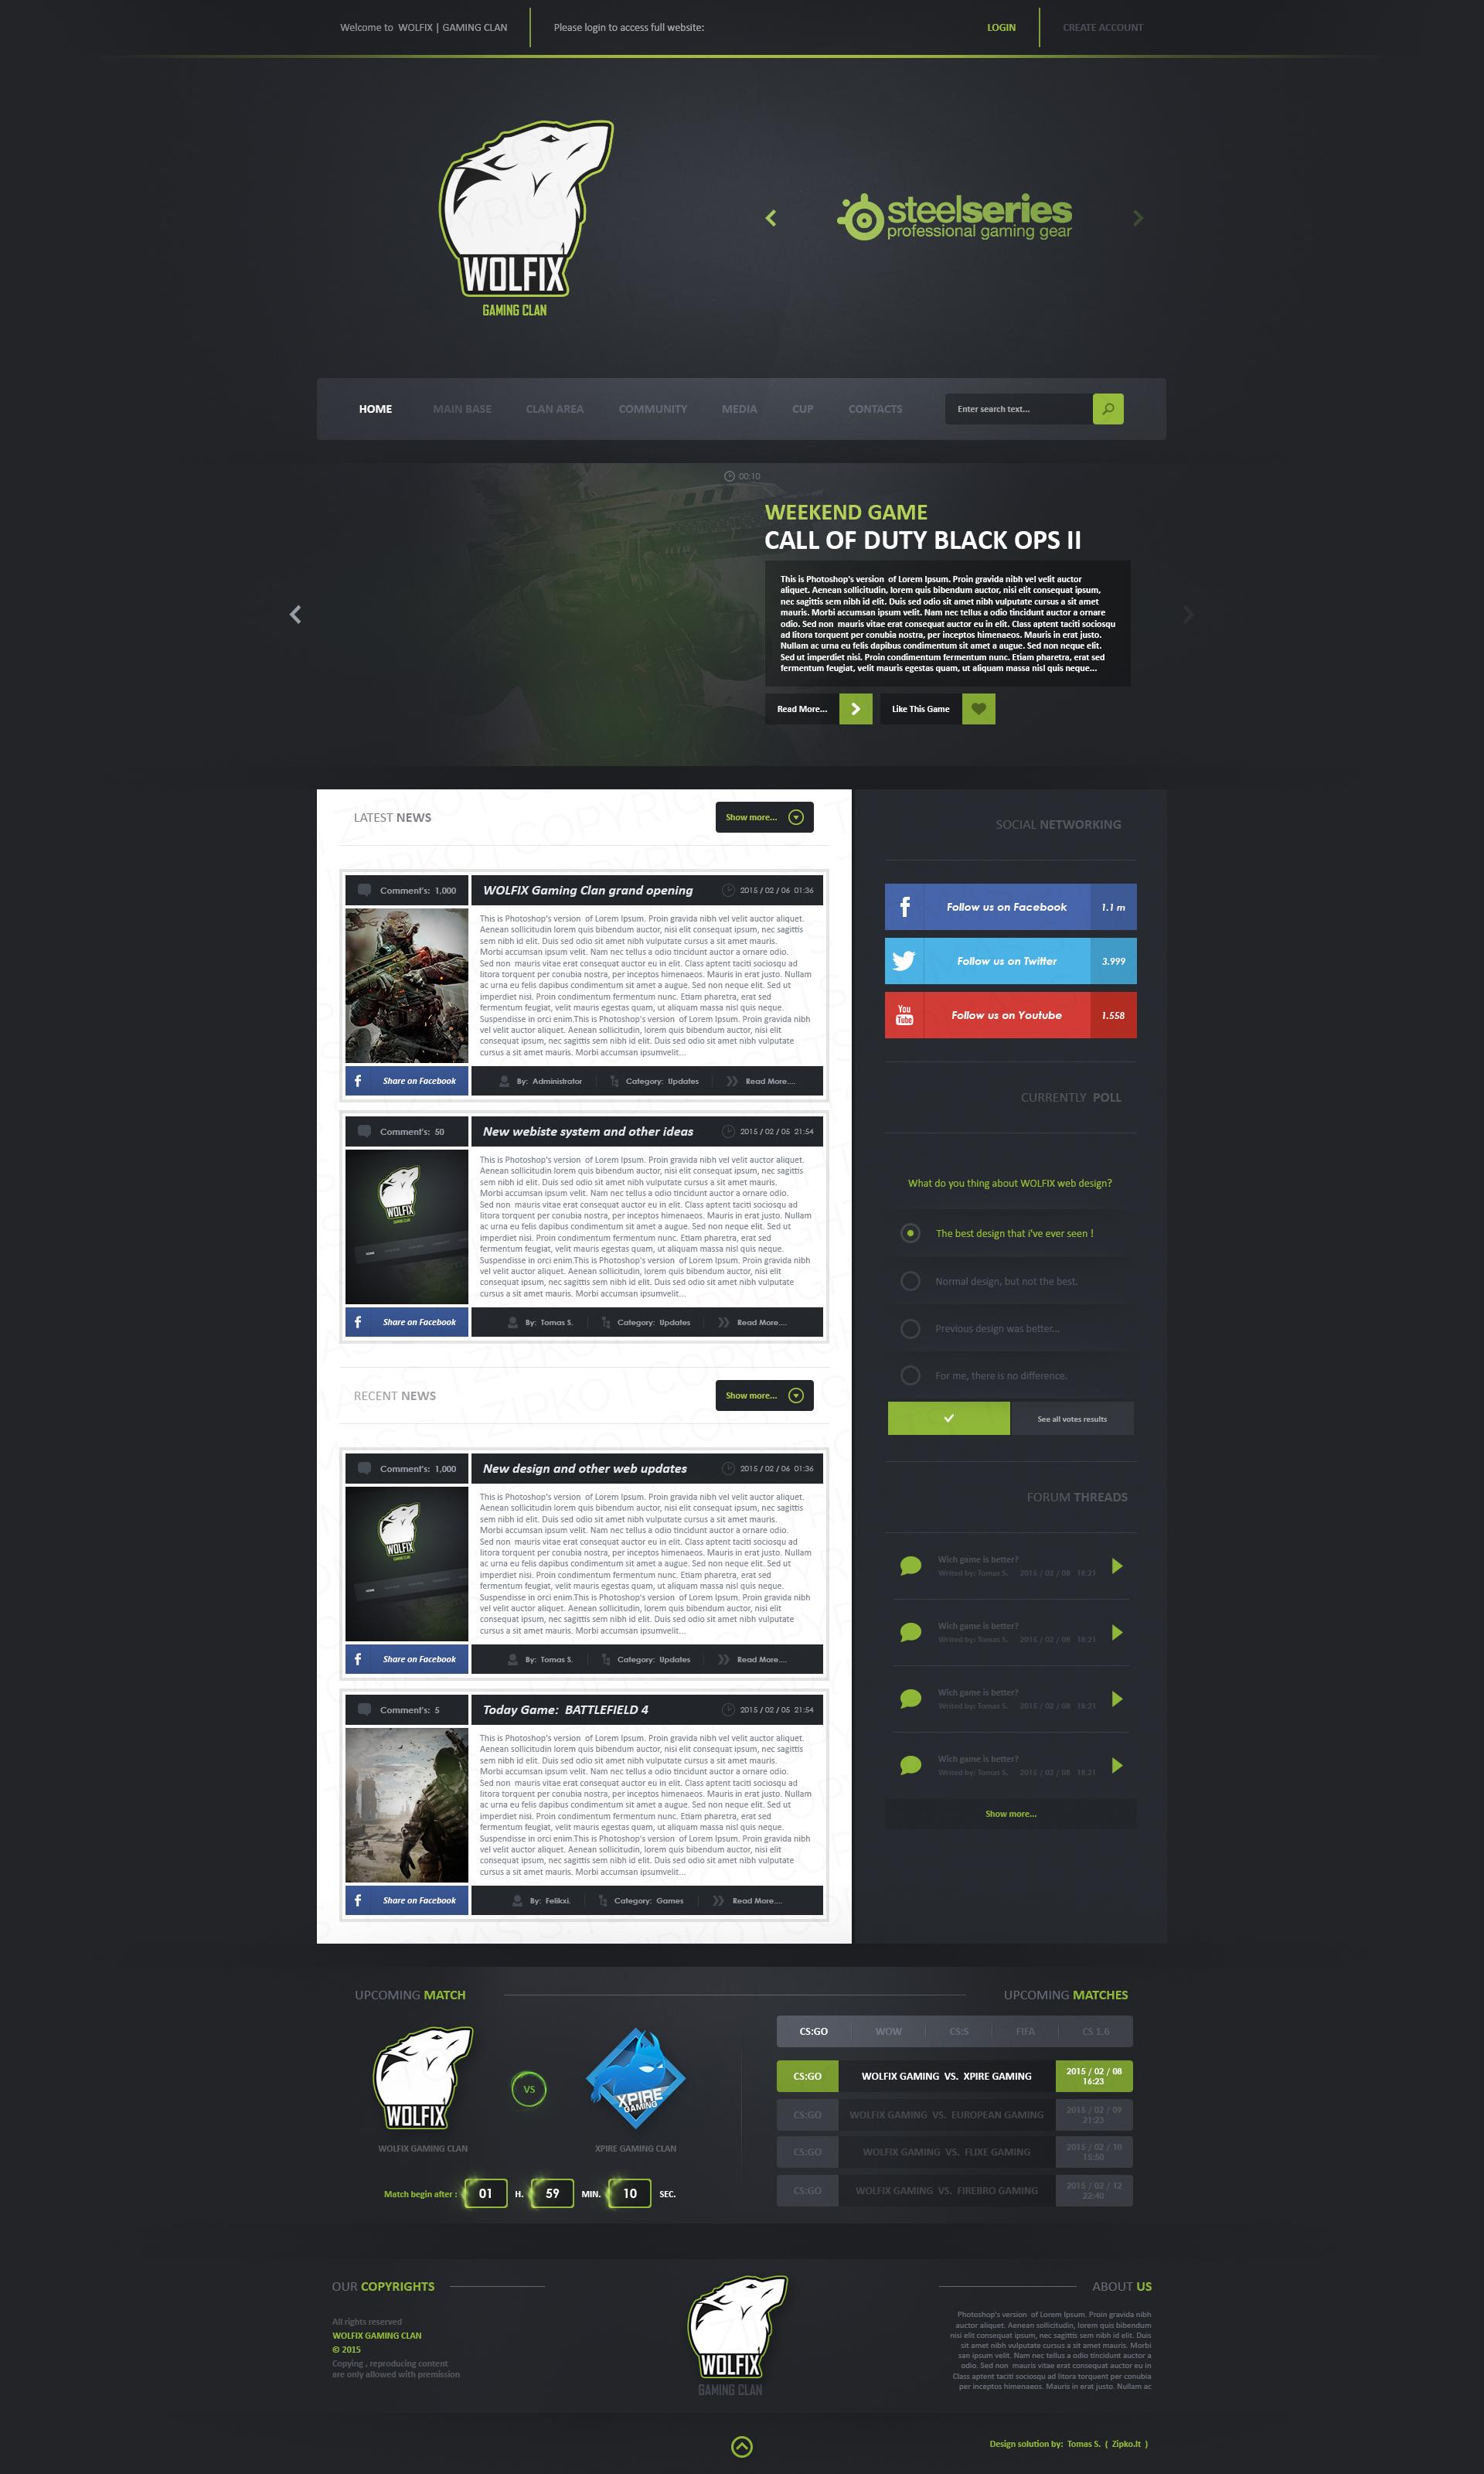 WOLFIX GAMING CLAN - Web design SOLD by TomZGFX on DeviantArt